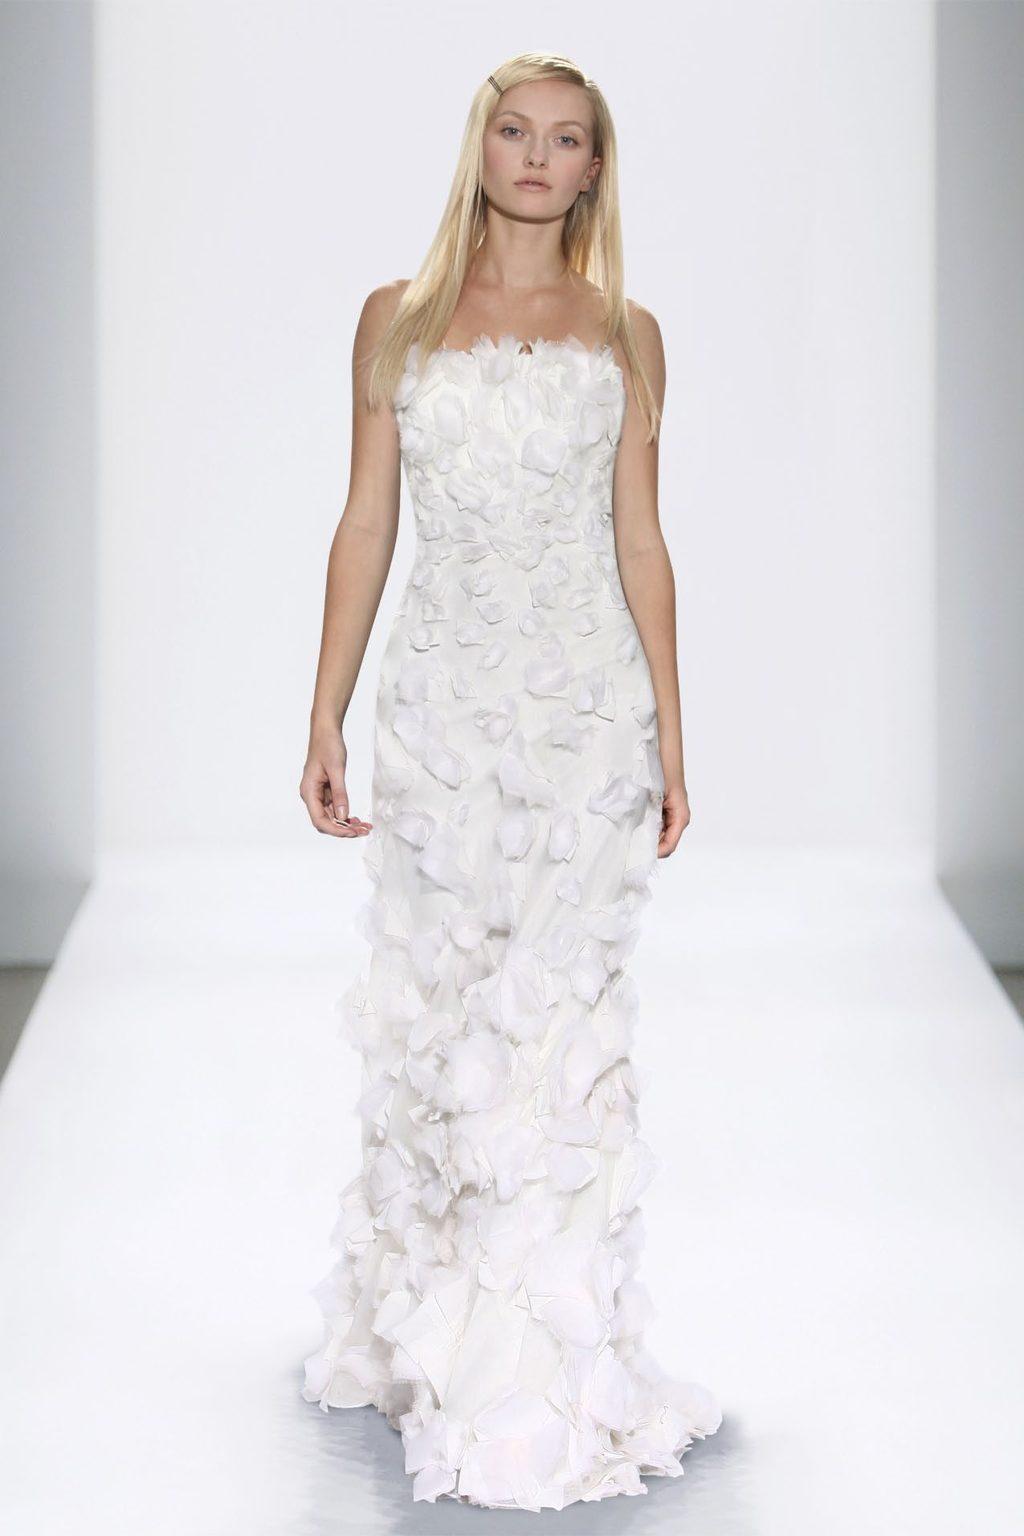 3D embellished white bridal gown